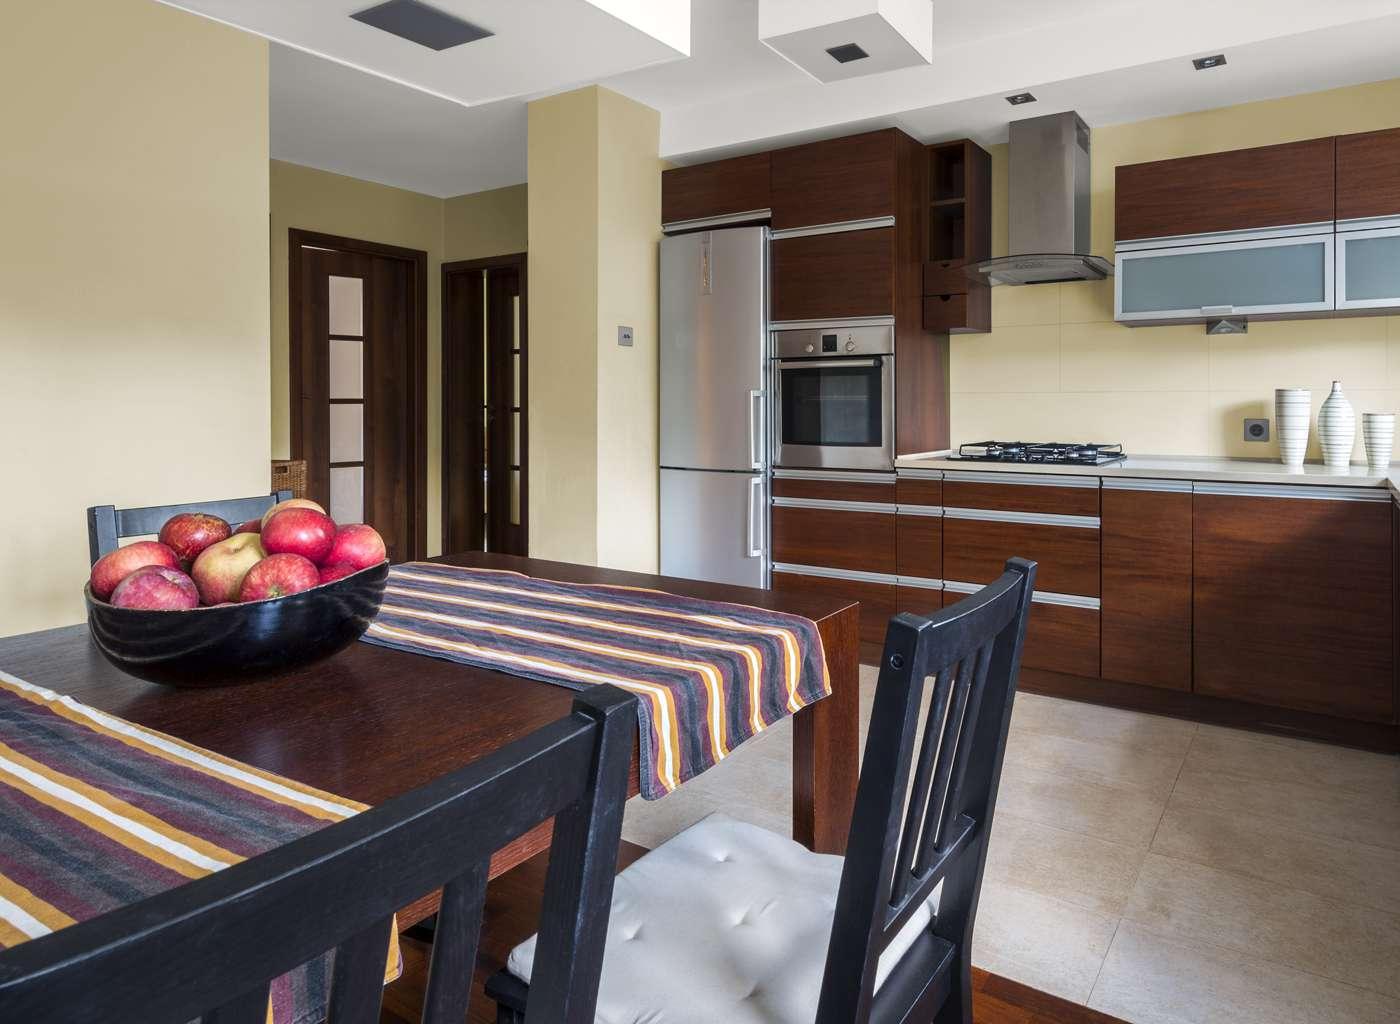 Surrey Kitchen Renovation Project